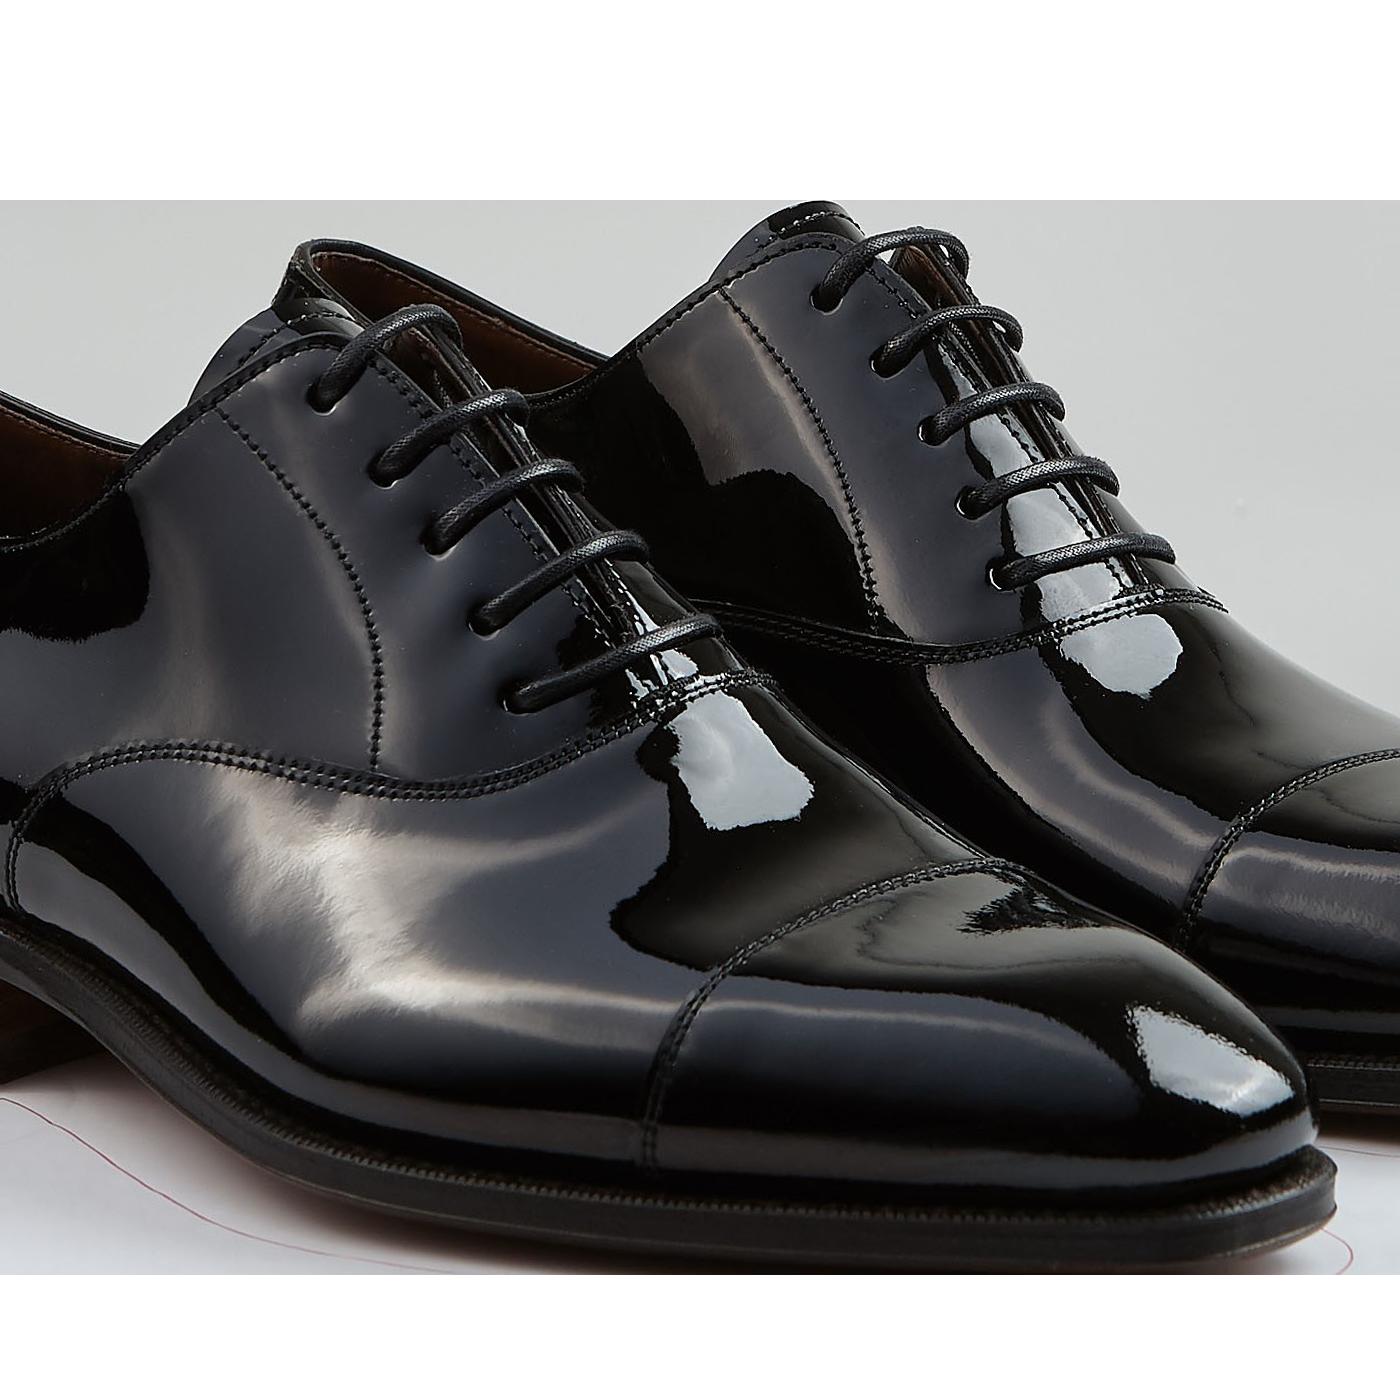 Carmina Black Rain Patent Leather Oxford Shoes Detail